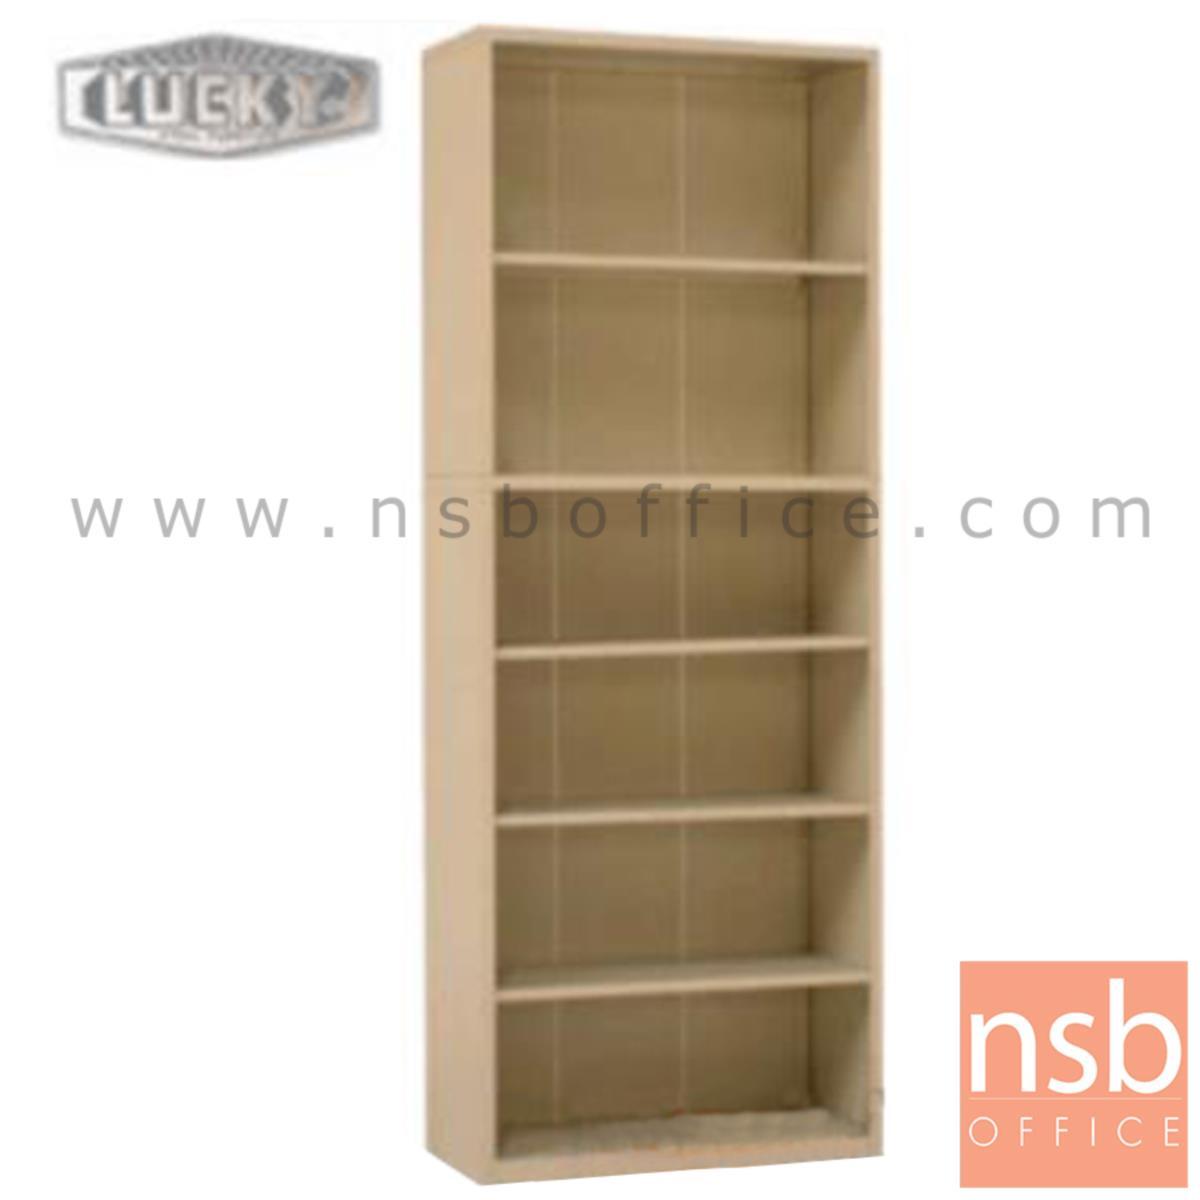 E28A035:ตู้วางหนังสือ 6 ช่องโล่ง 76.2W*32D*198.1H cm. รุ่น LUCKY-SB-3078